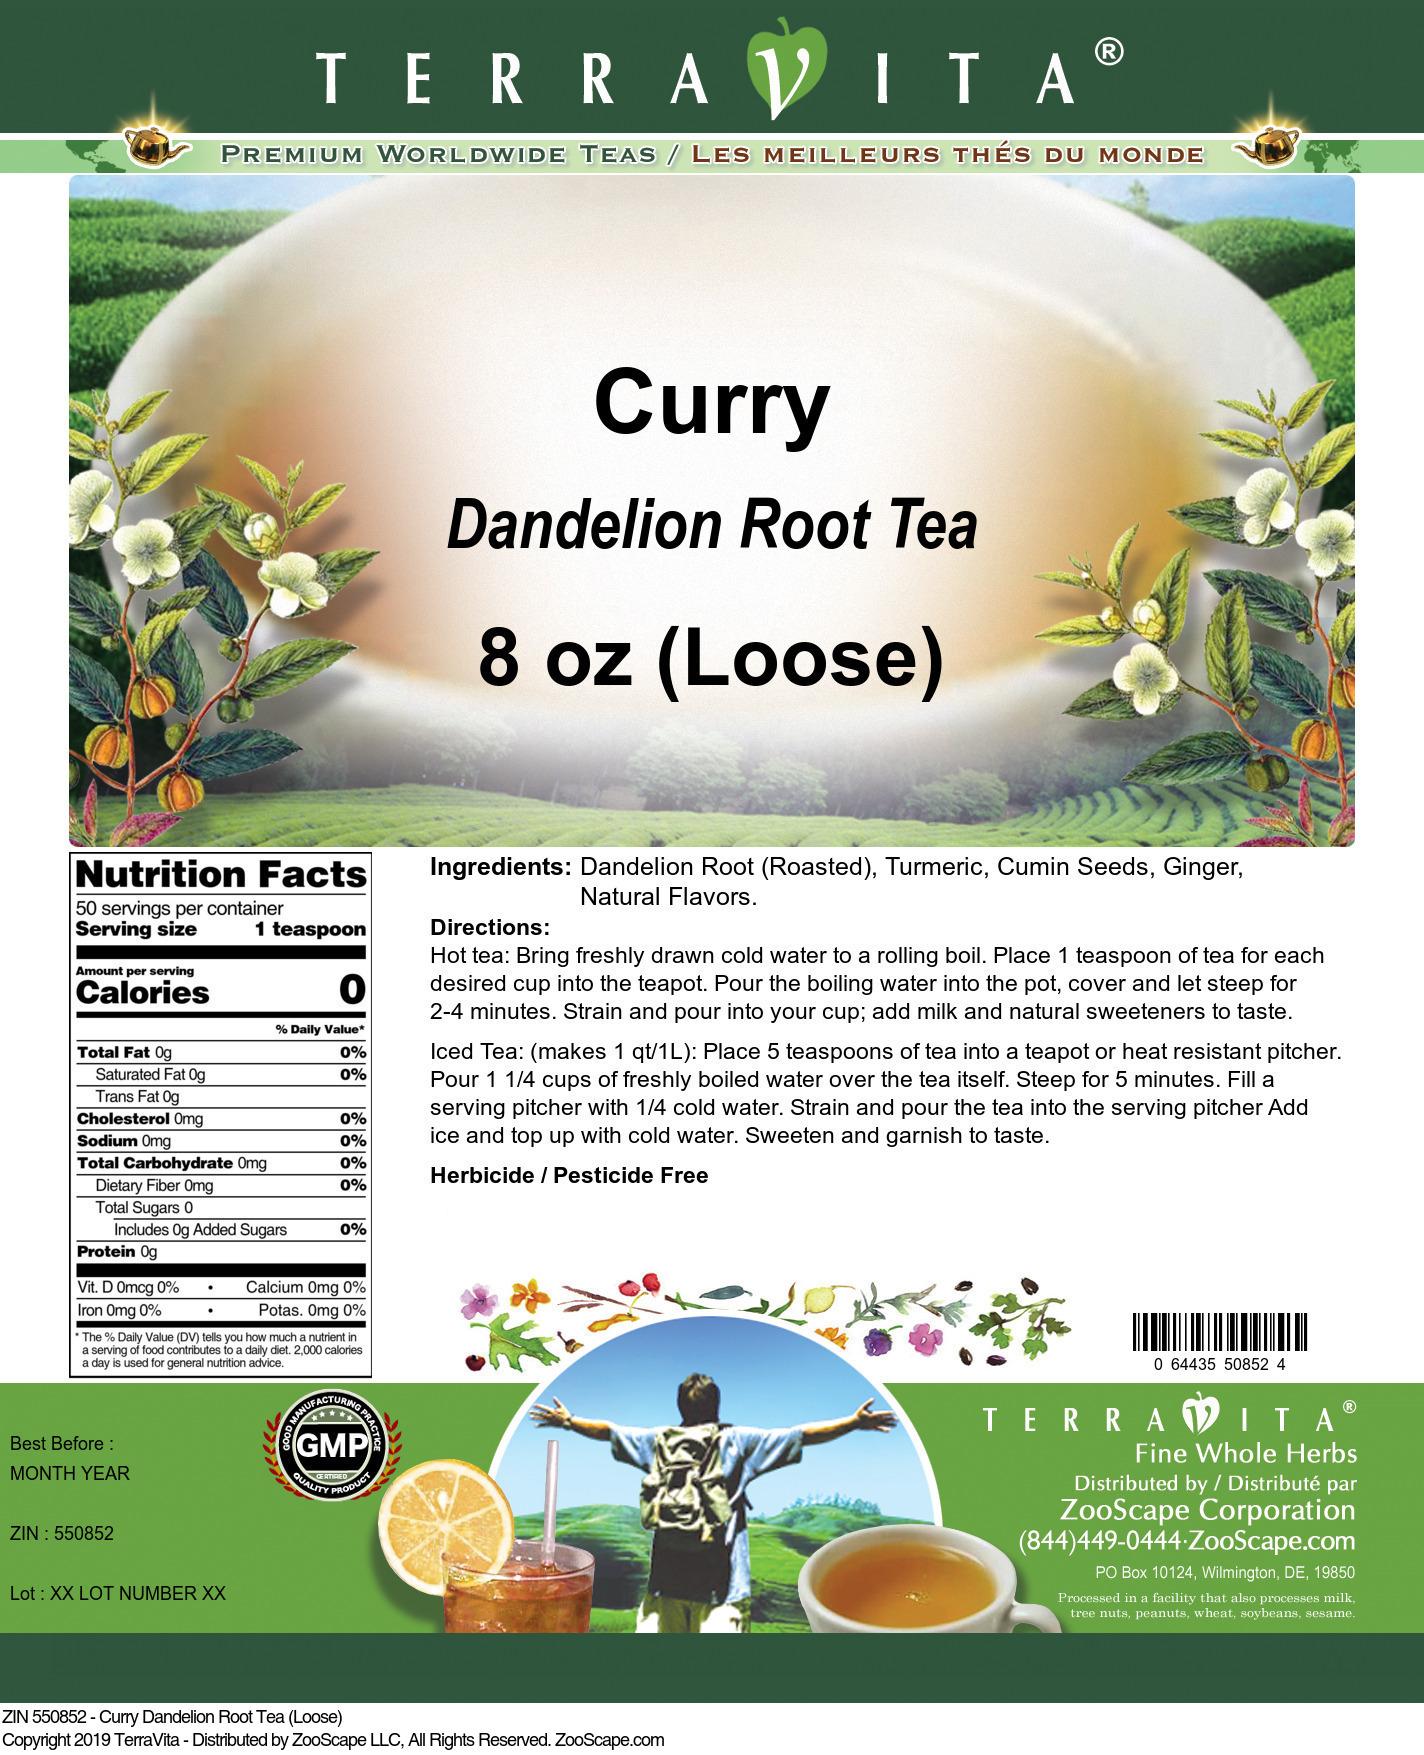 Curry Dandelion Root Tea (Loose)